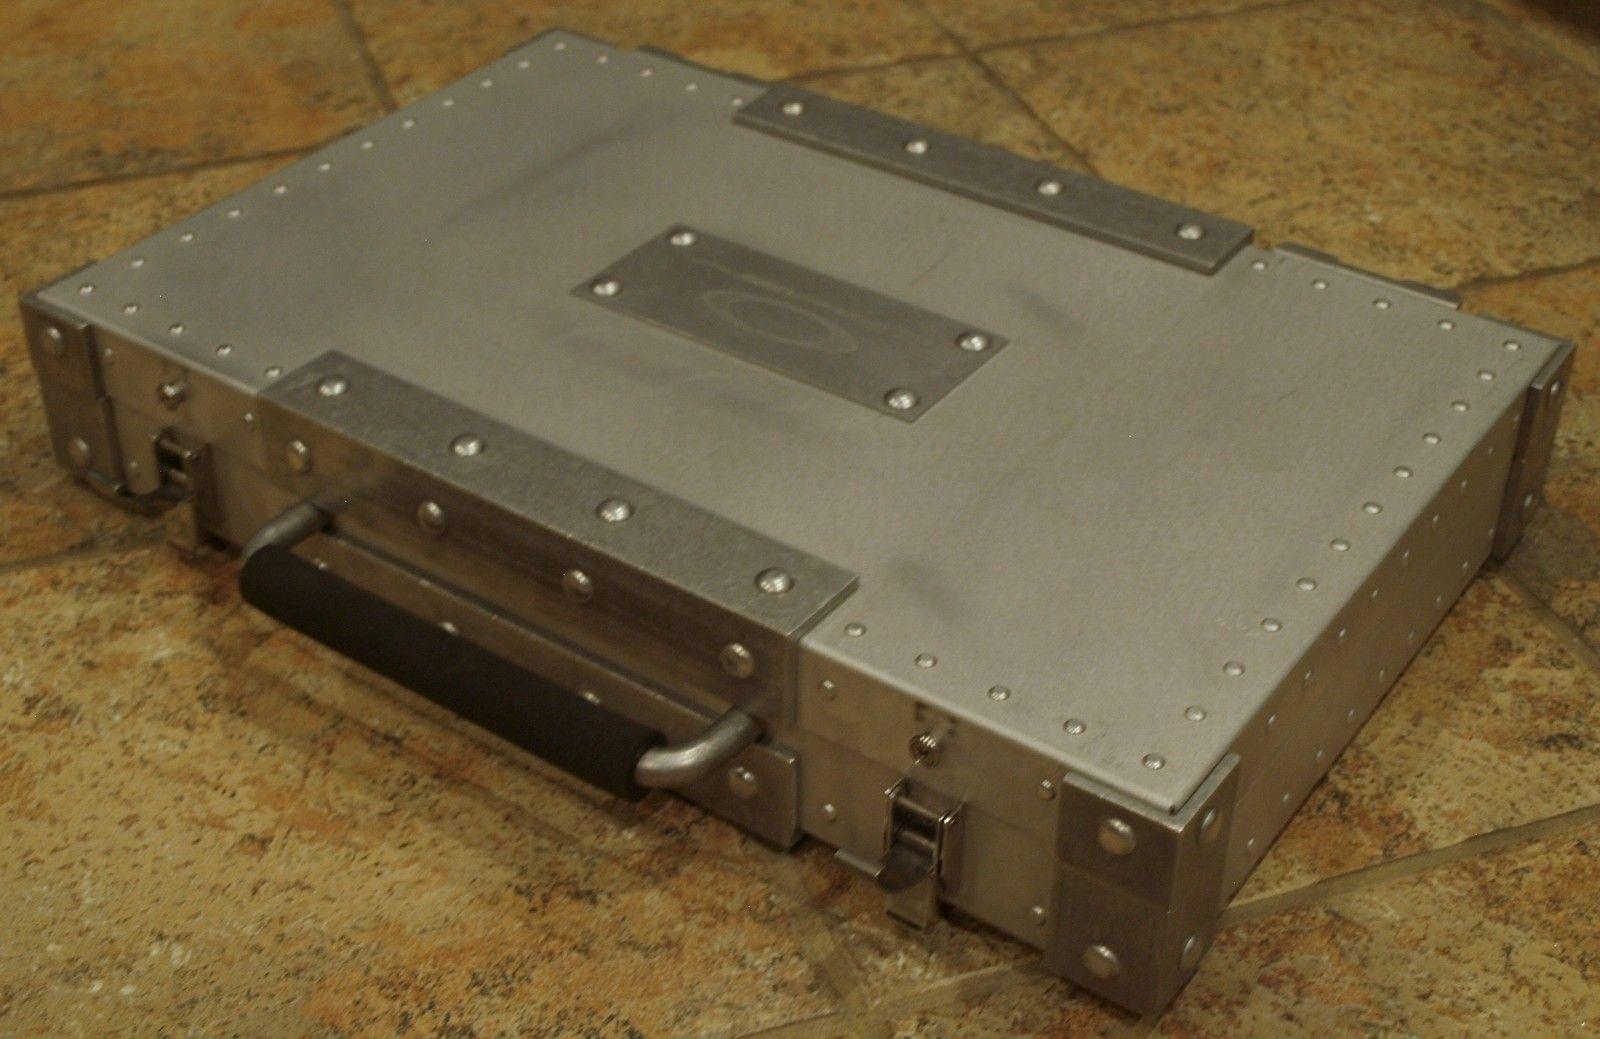 X Metal Briefcase - briefcametal012.jpg